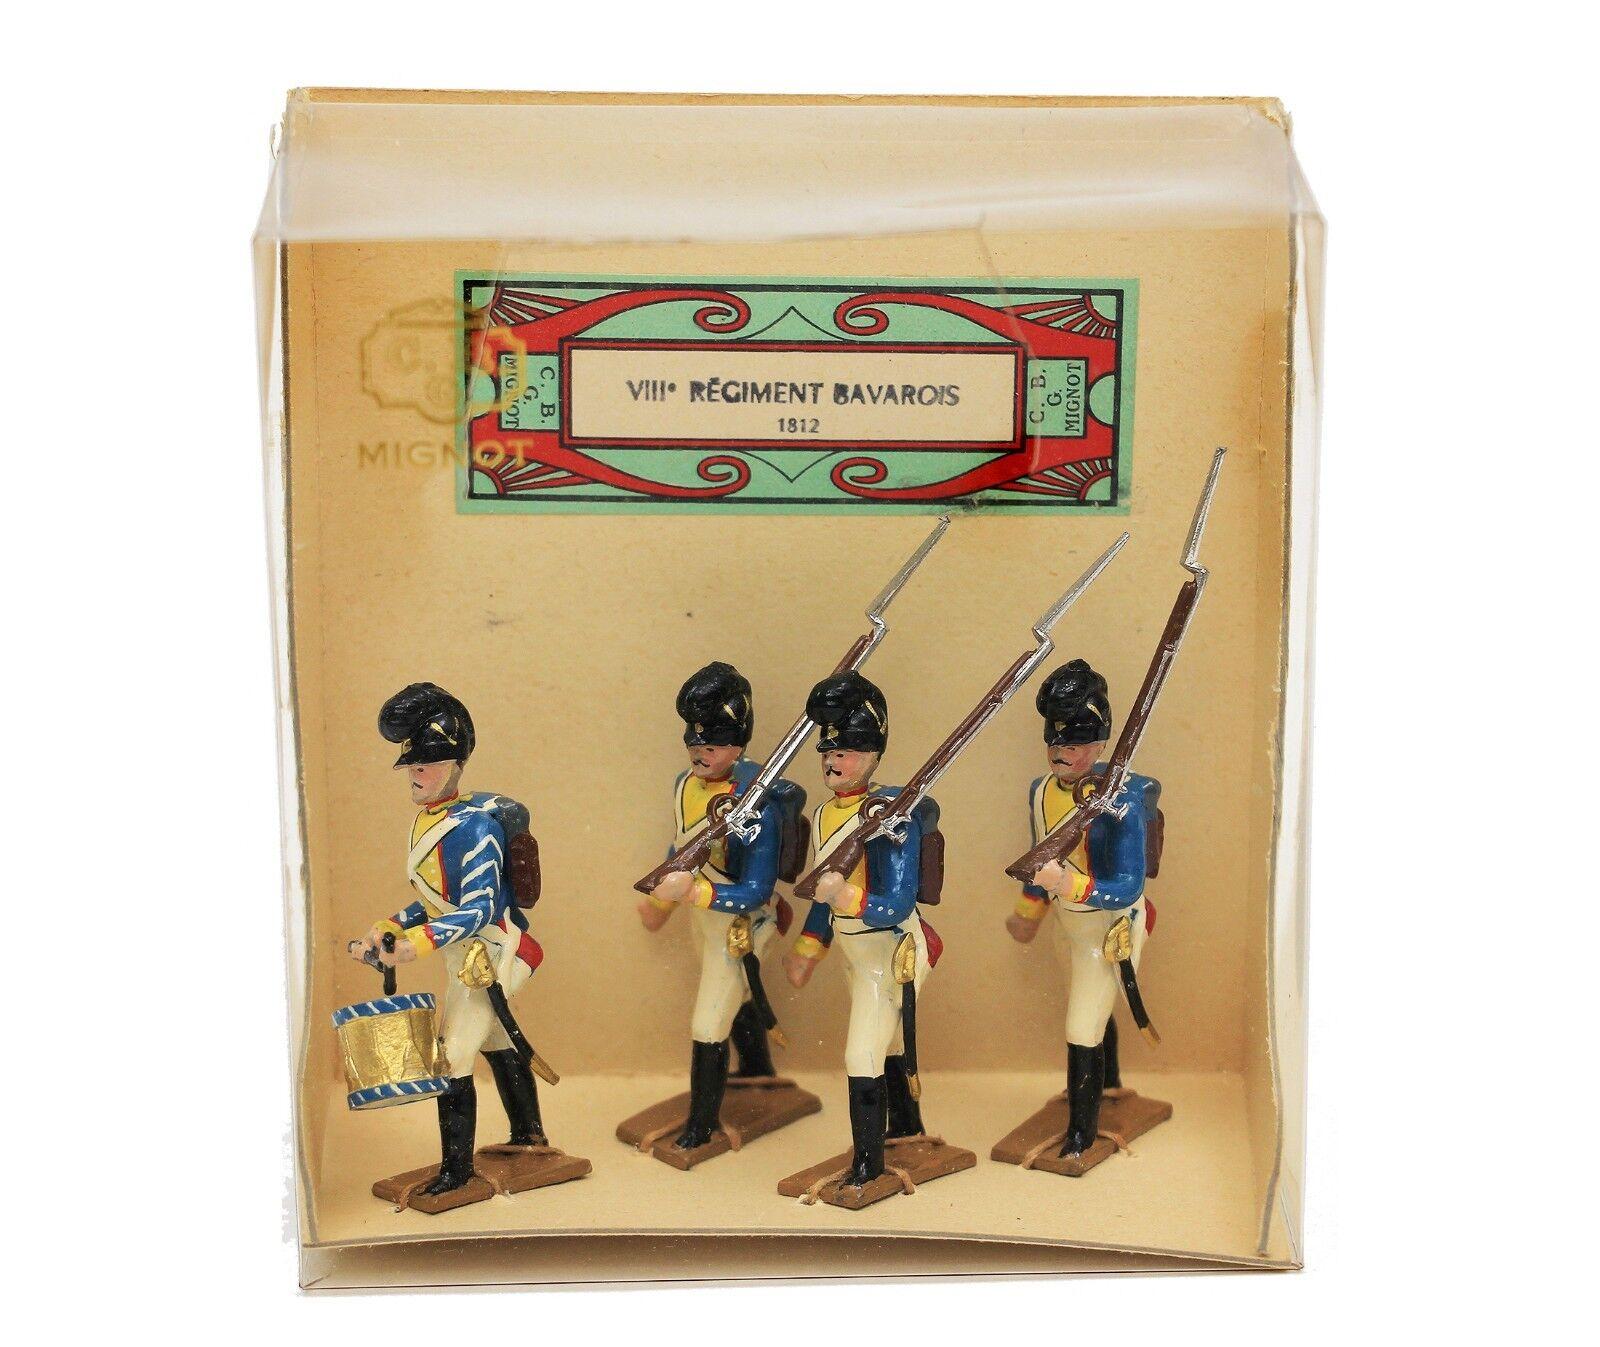 Vintage CBG Mignot a VIII Regiment Bavarois Bavarian New in Box